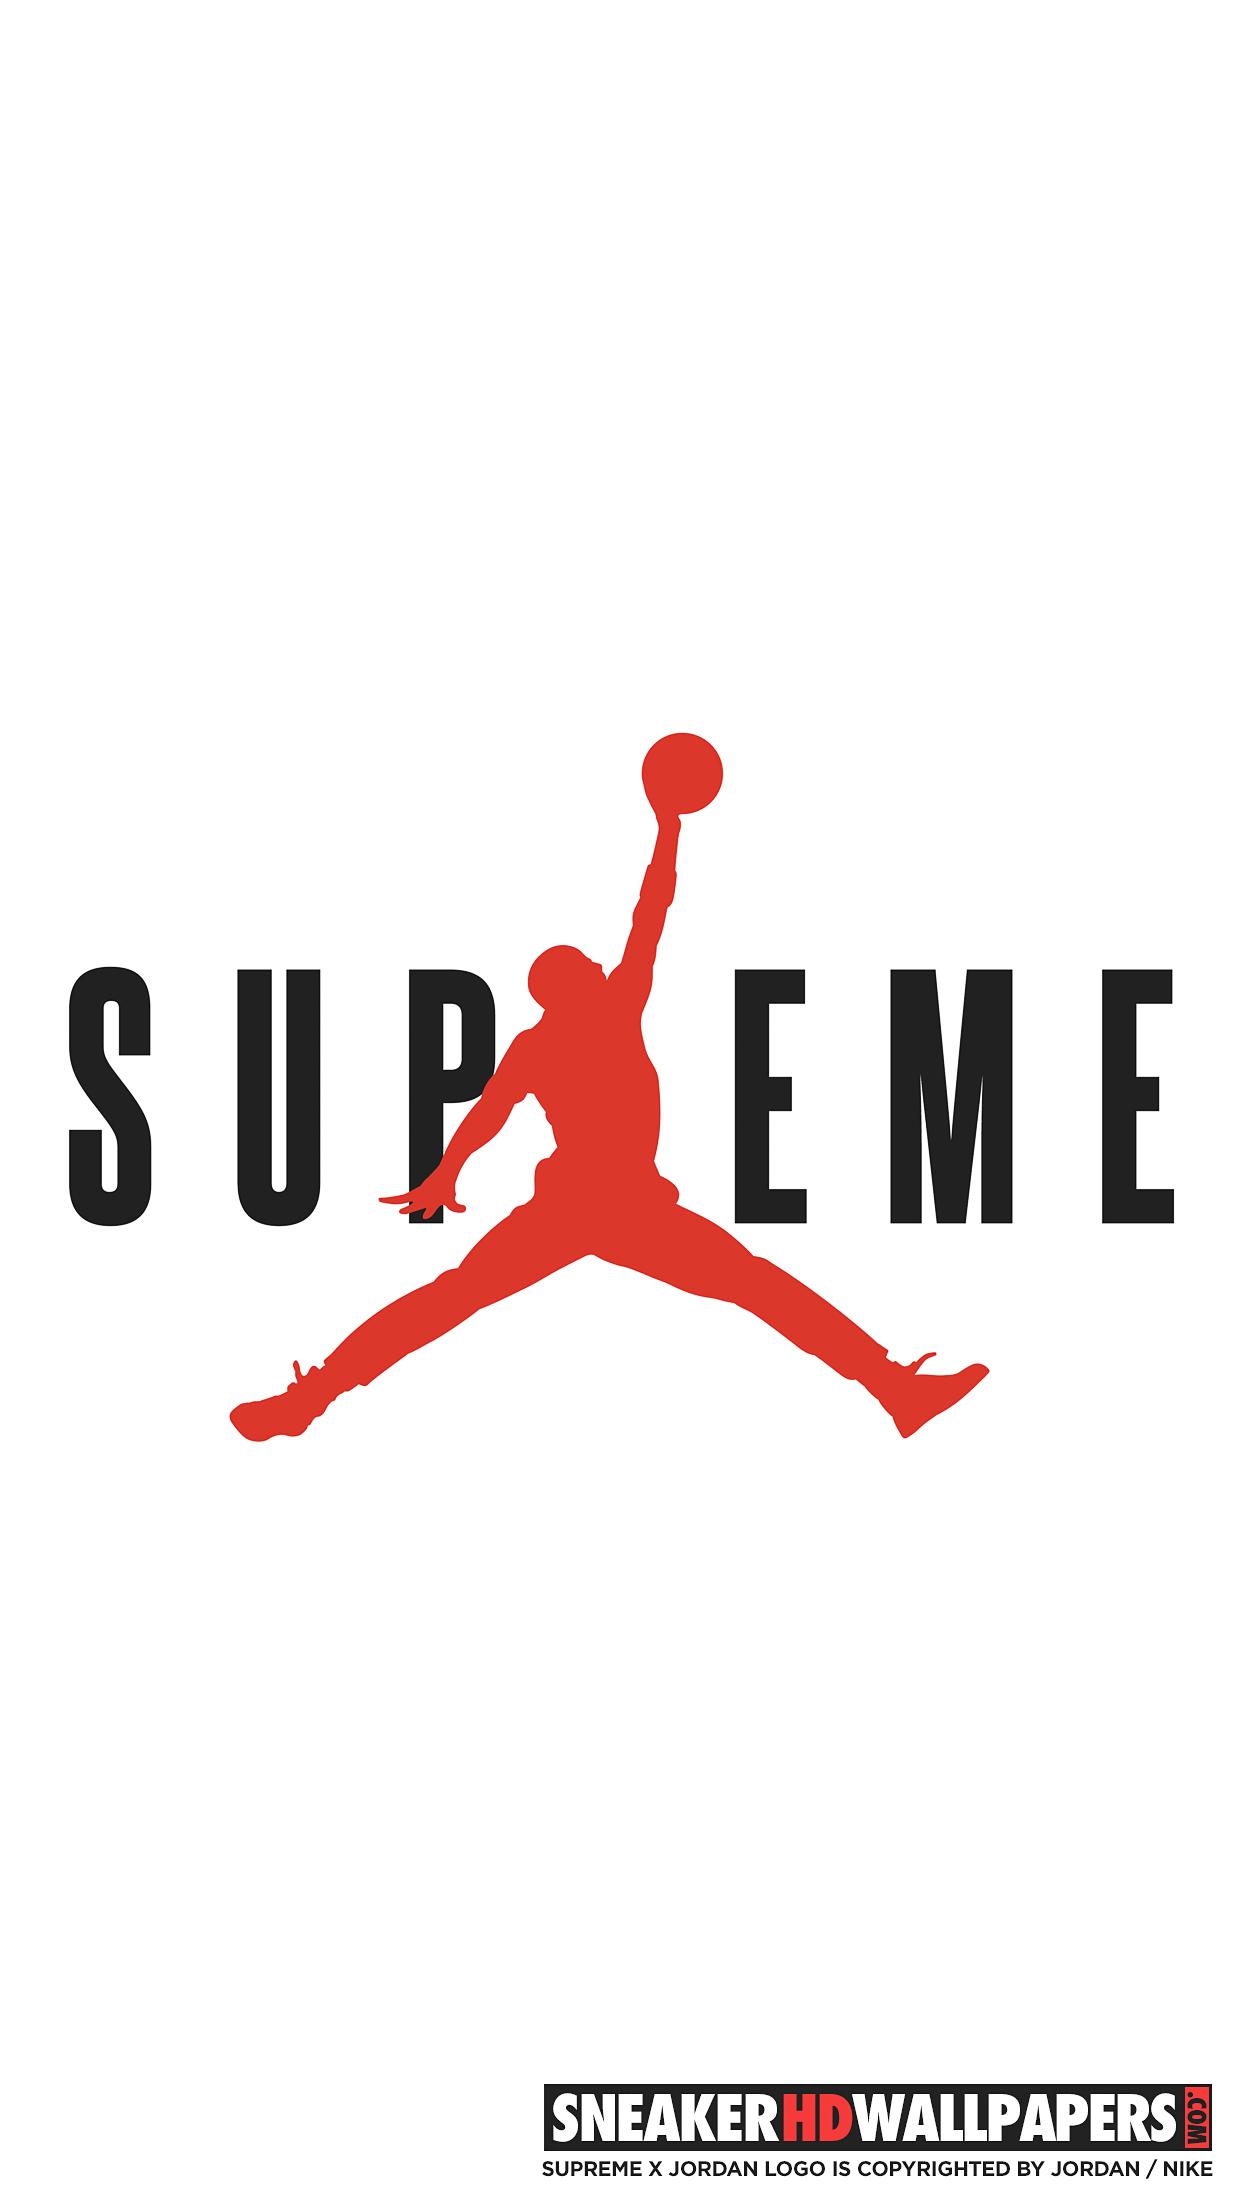 Jordan 4K wallpaper Supreme x Jordan HD wallpaper Supreme x Jordan 1242x2208